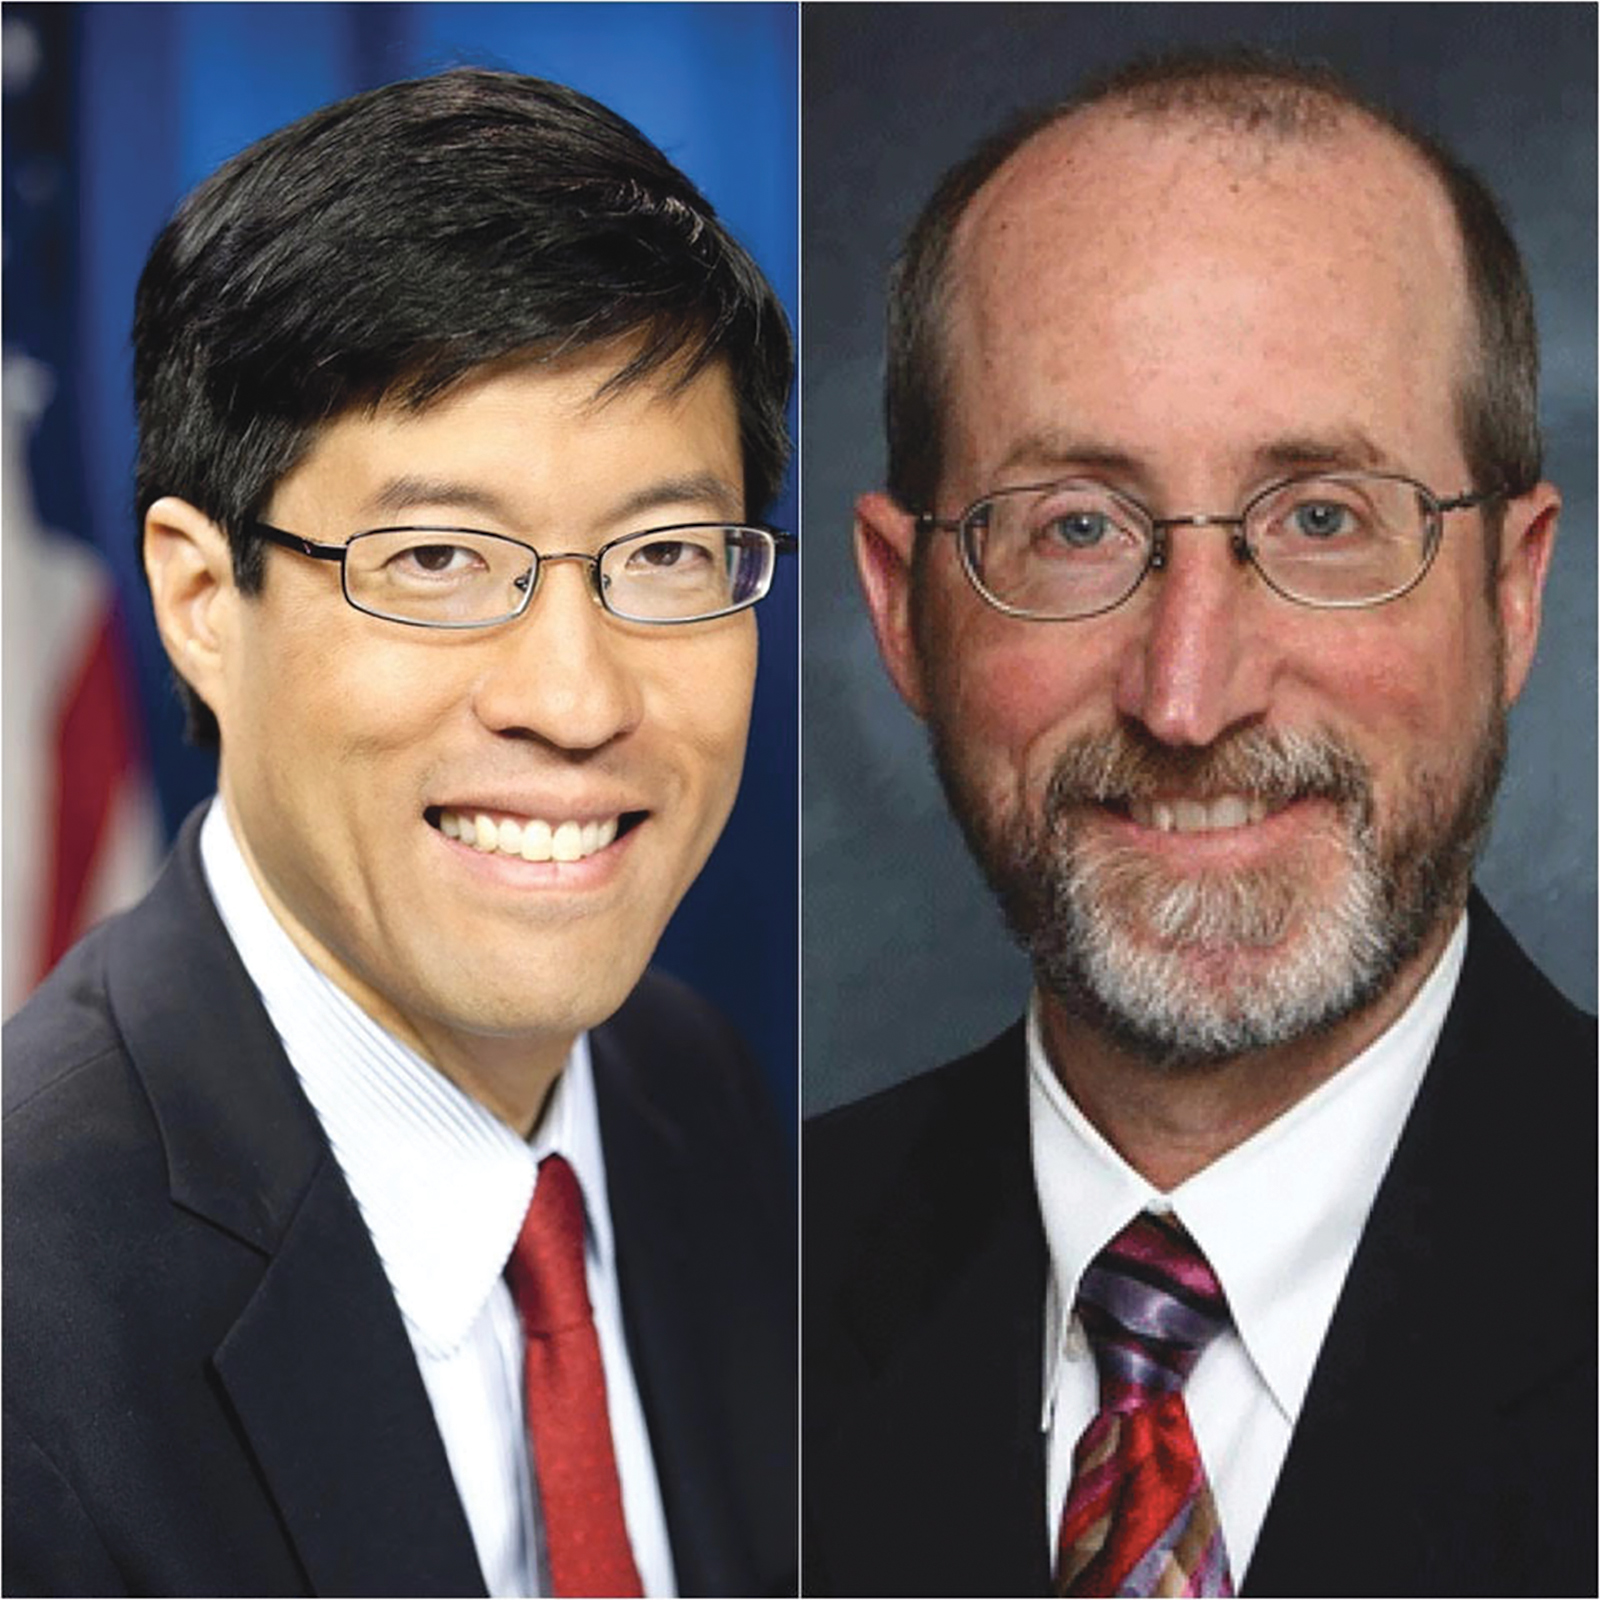 Left-Senator Richard Pan (D-Sacramento), Right-Senator Steven Glazer (D-Contra Costa) (CBM courtesy photo)